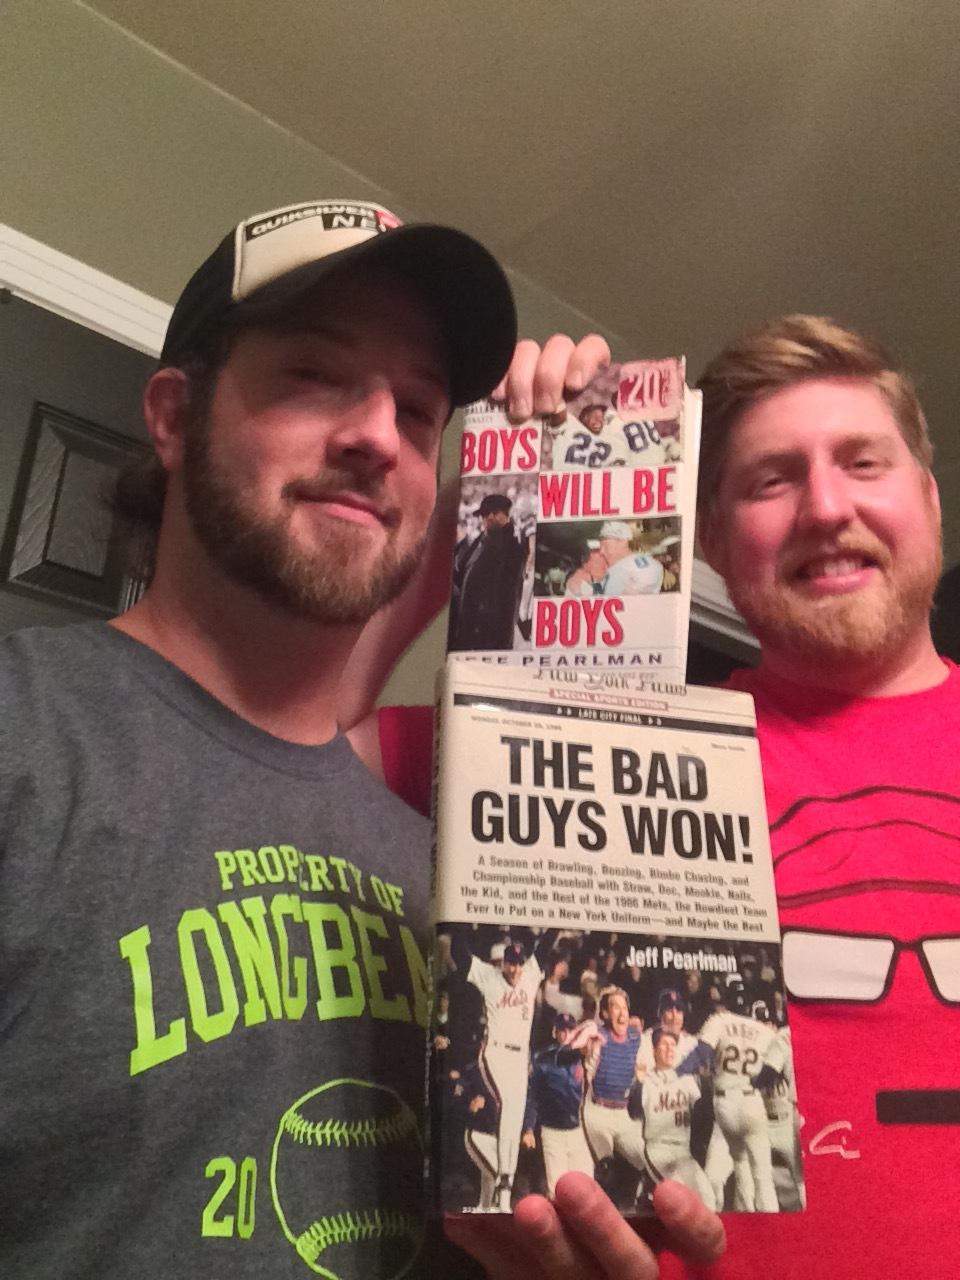 Drew & DaveWalk It Off!Sundays, 11 PM –12 AMBoys Will Be Boys / The Bad Guys Won!Jeff PearlmanHarperCollins -